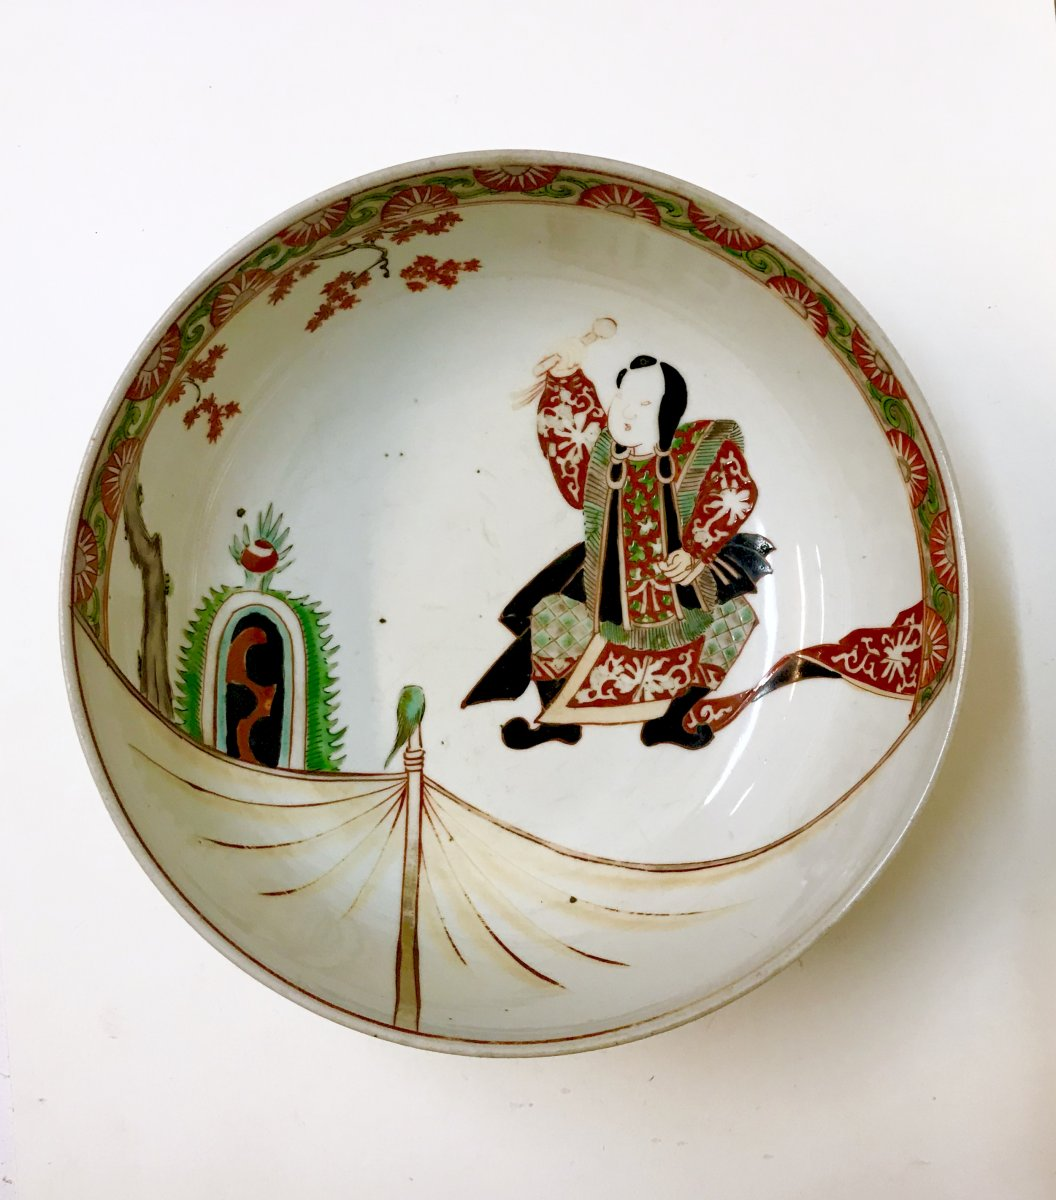 Japan. Late Edo Period. Large Porcelain Bowl Saiko-kutani. Circa 1850